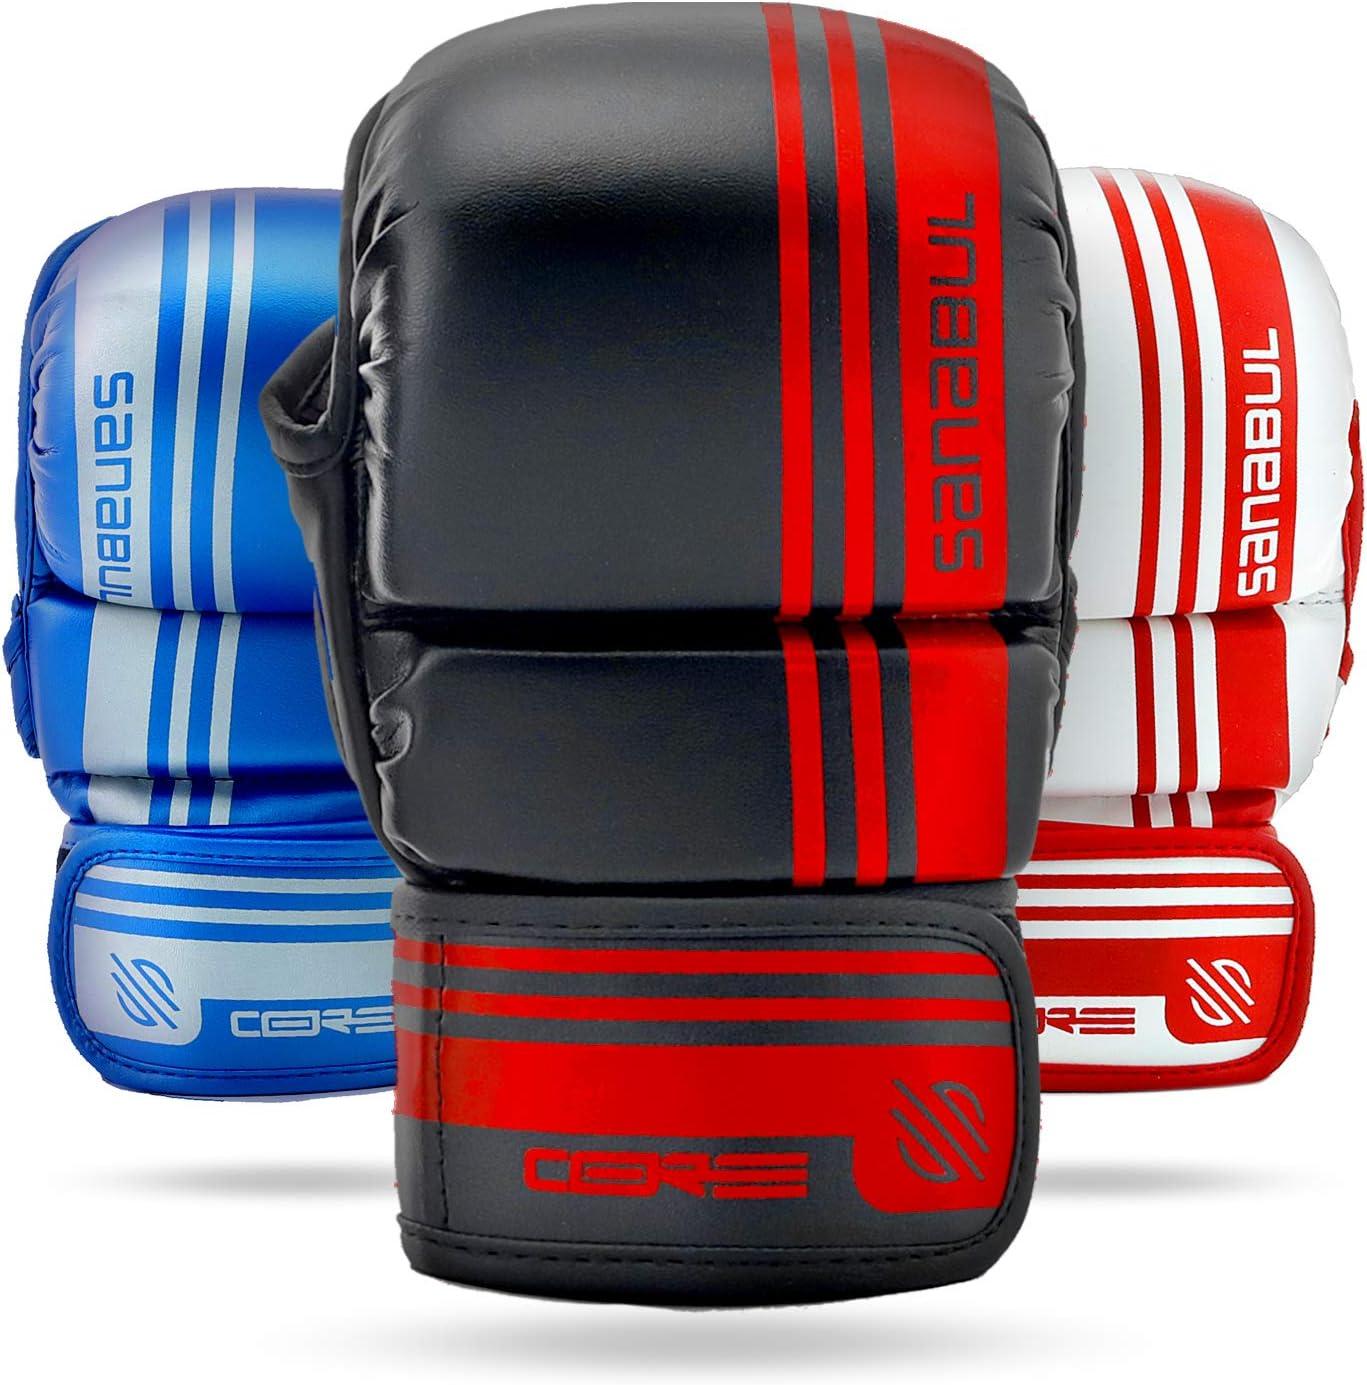 Farabi 7-oz MMA Gloves Hybrid Semi-Pro Open Hand Gloves Punching Training even Compition